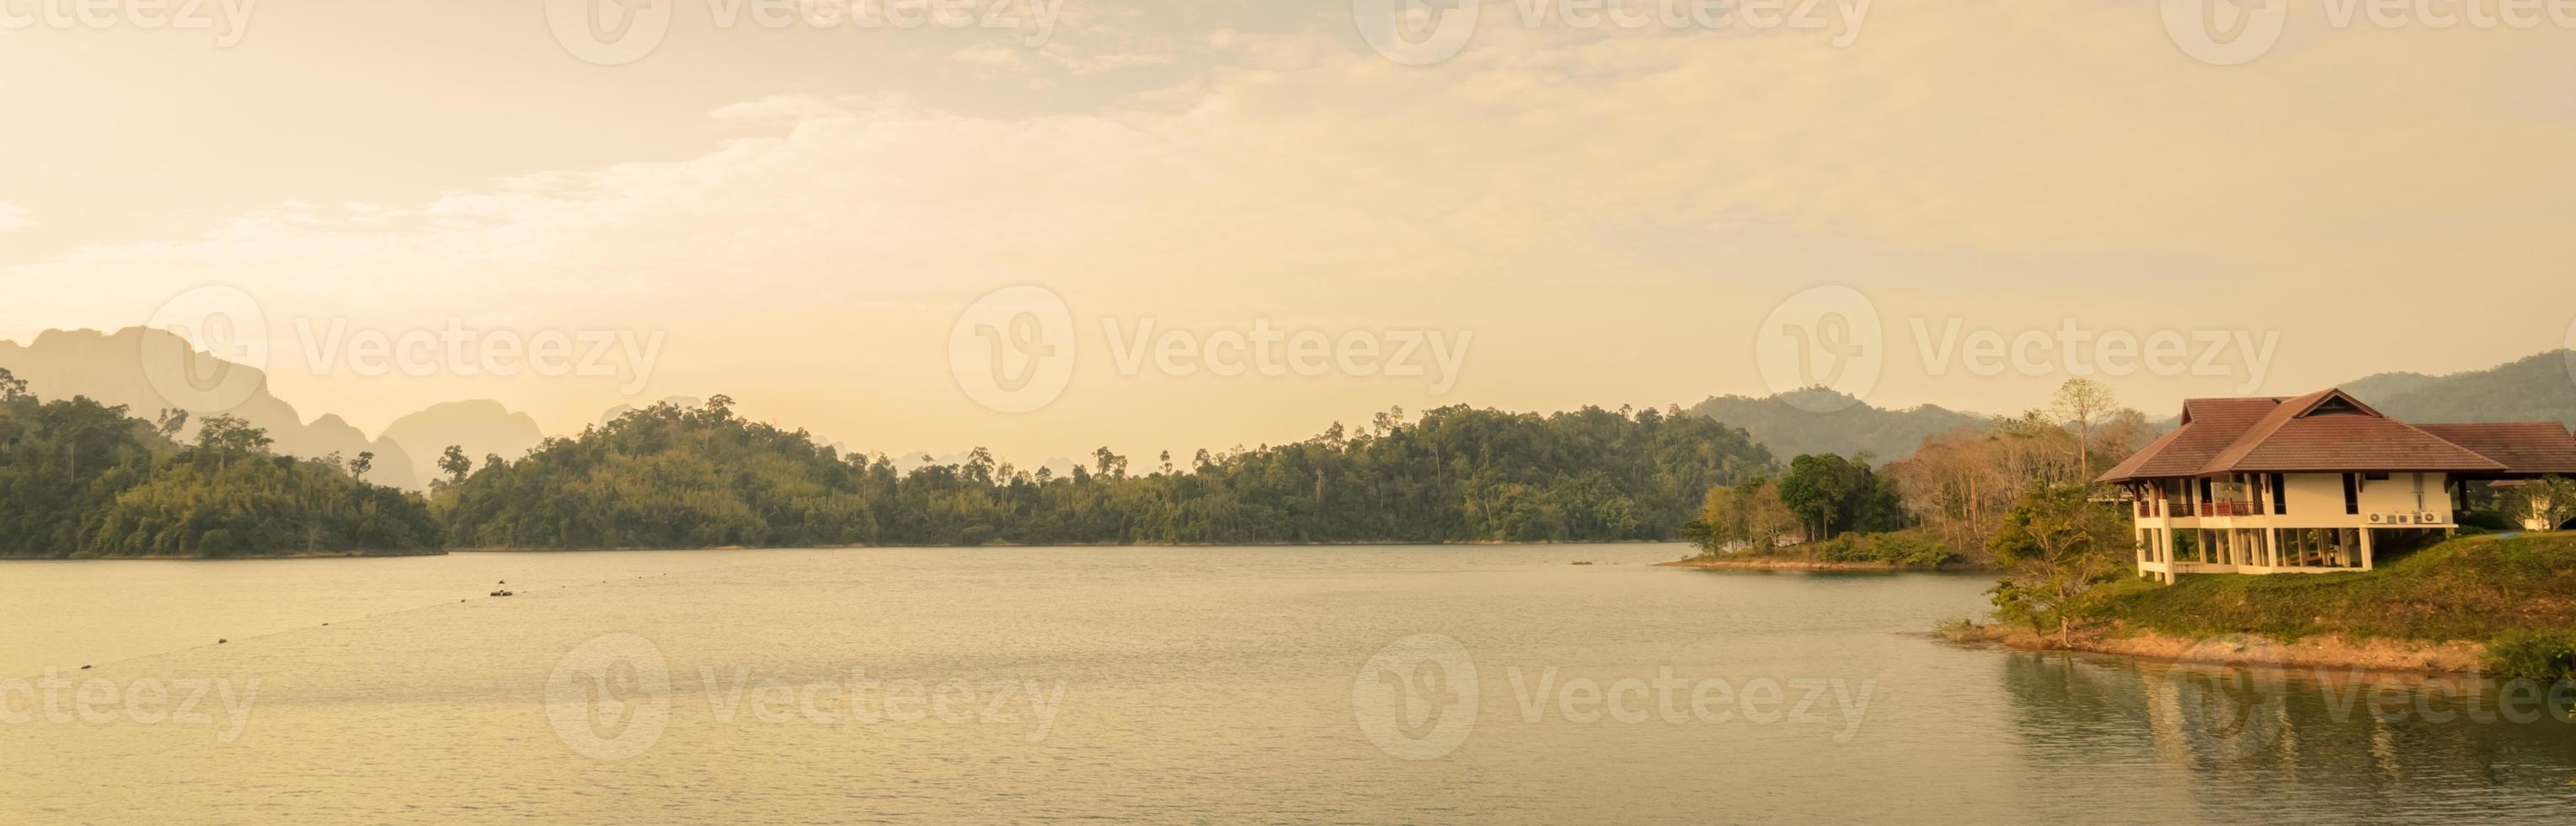 Ratchaprapha Dam in Surat Thani province,Thailand photo